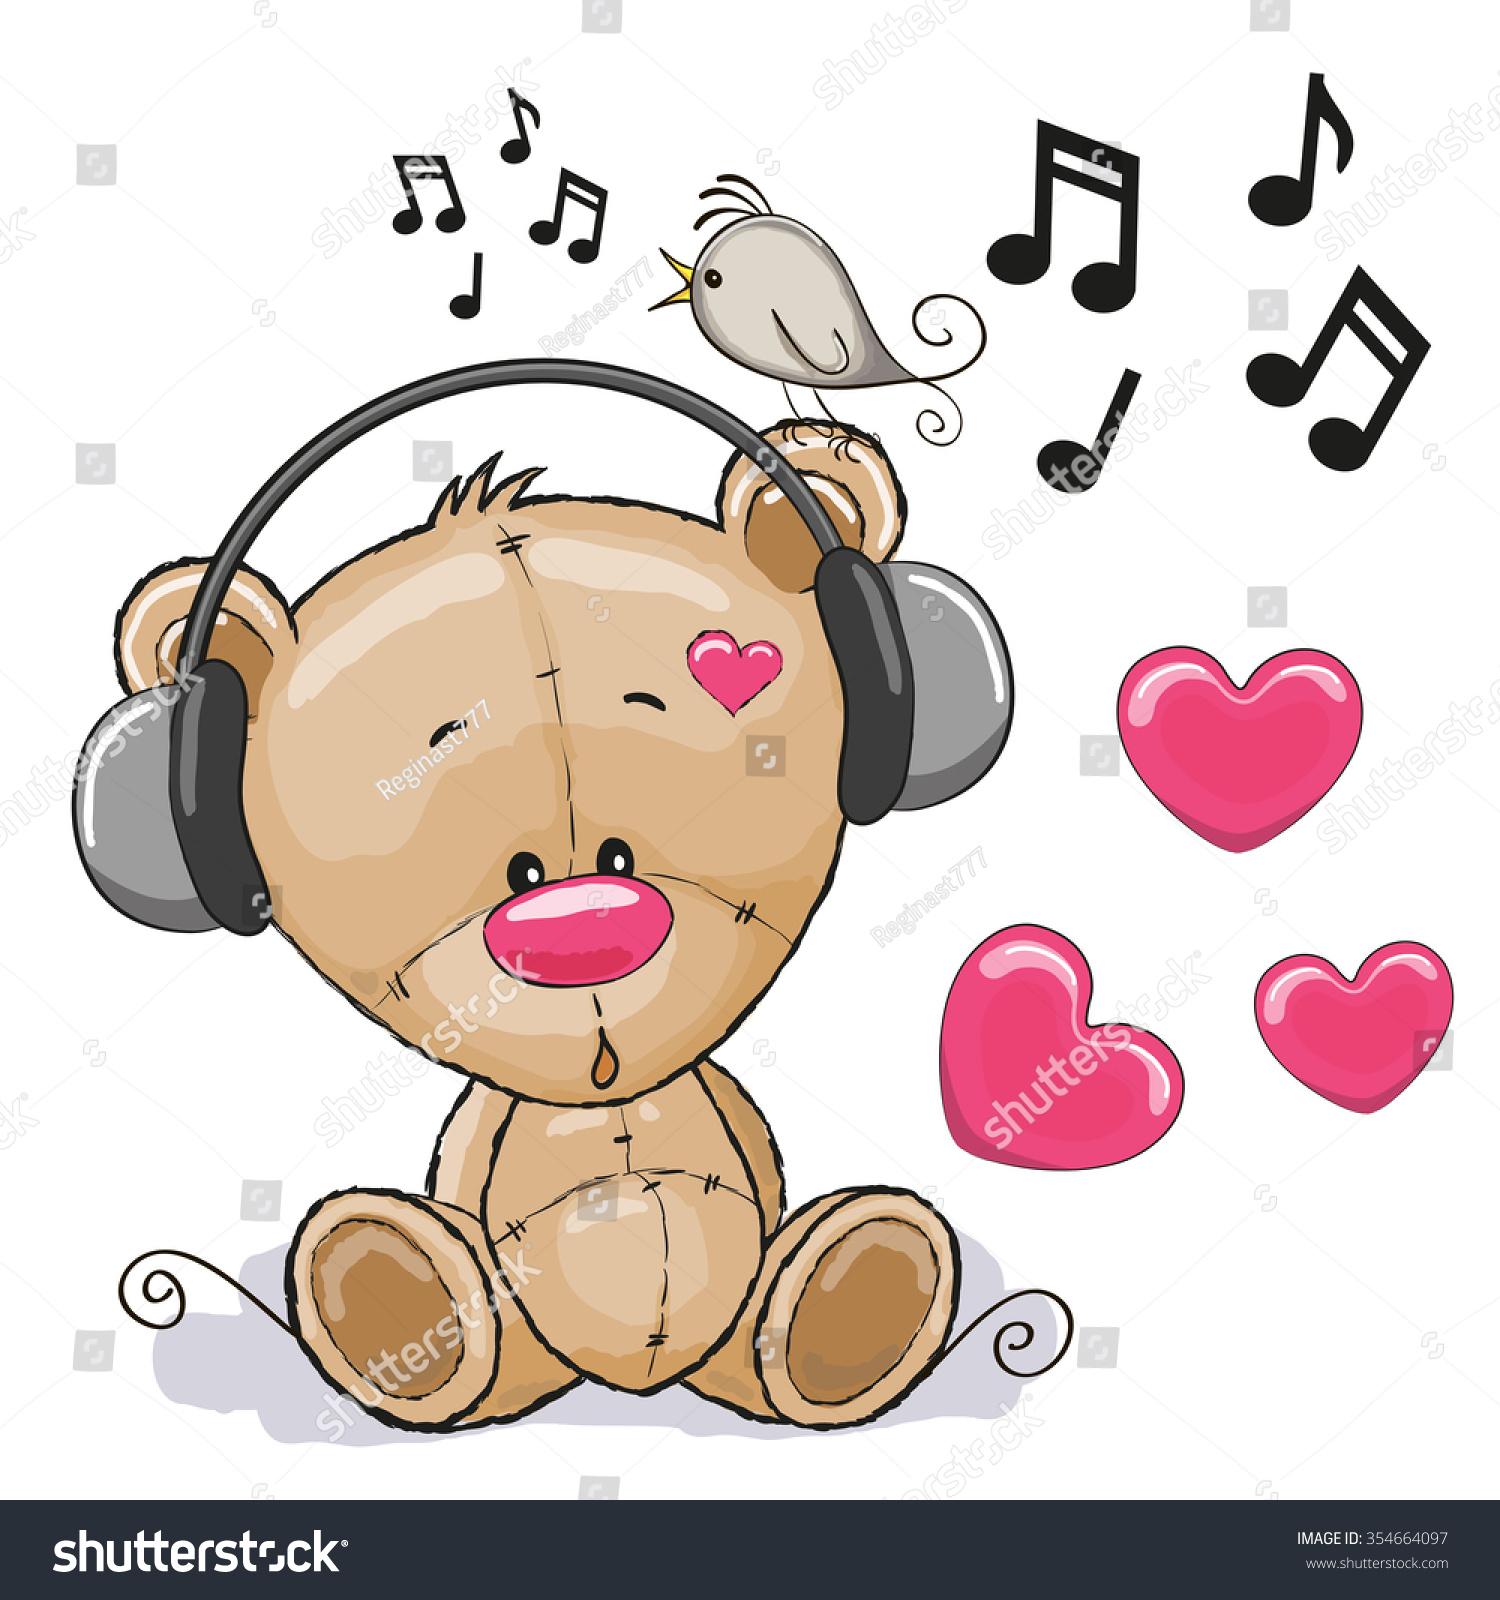 Cute Cartoon Teddy Bear Headphones Stock Illustration ...